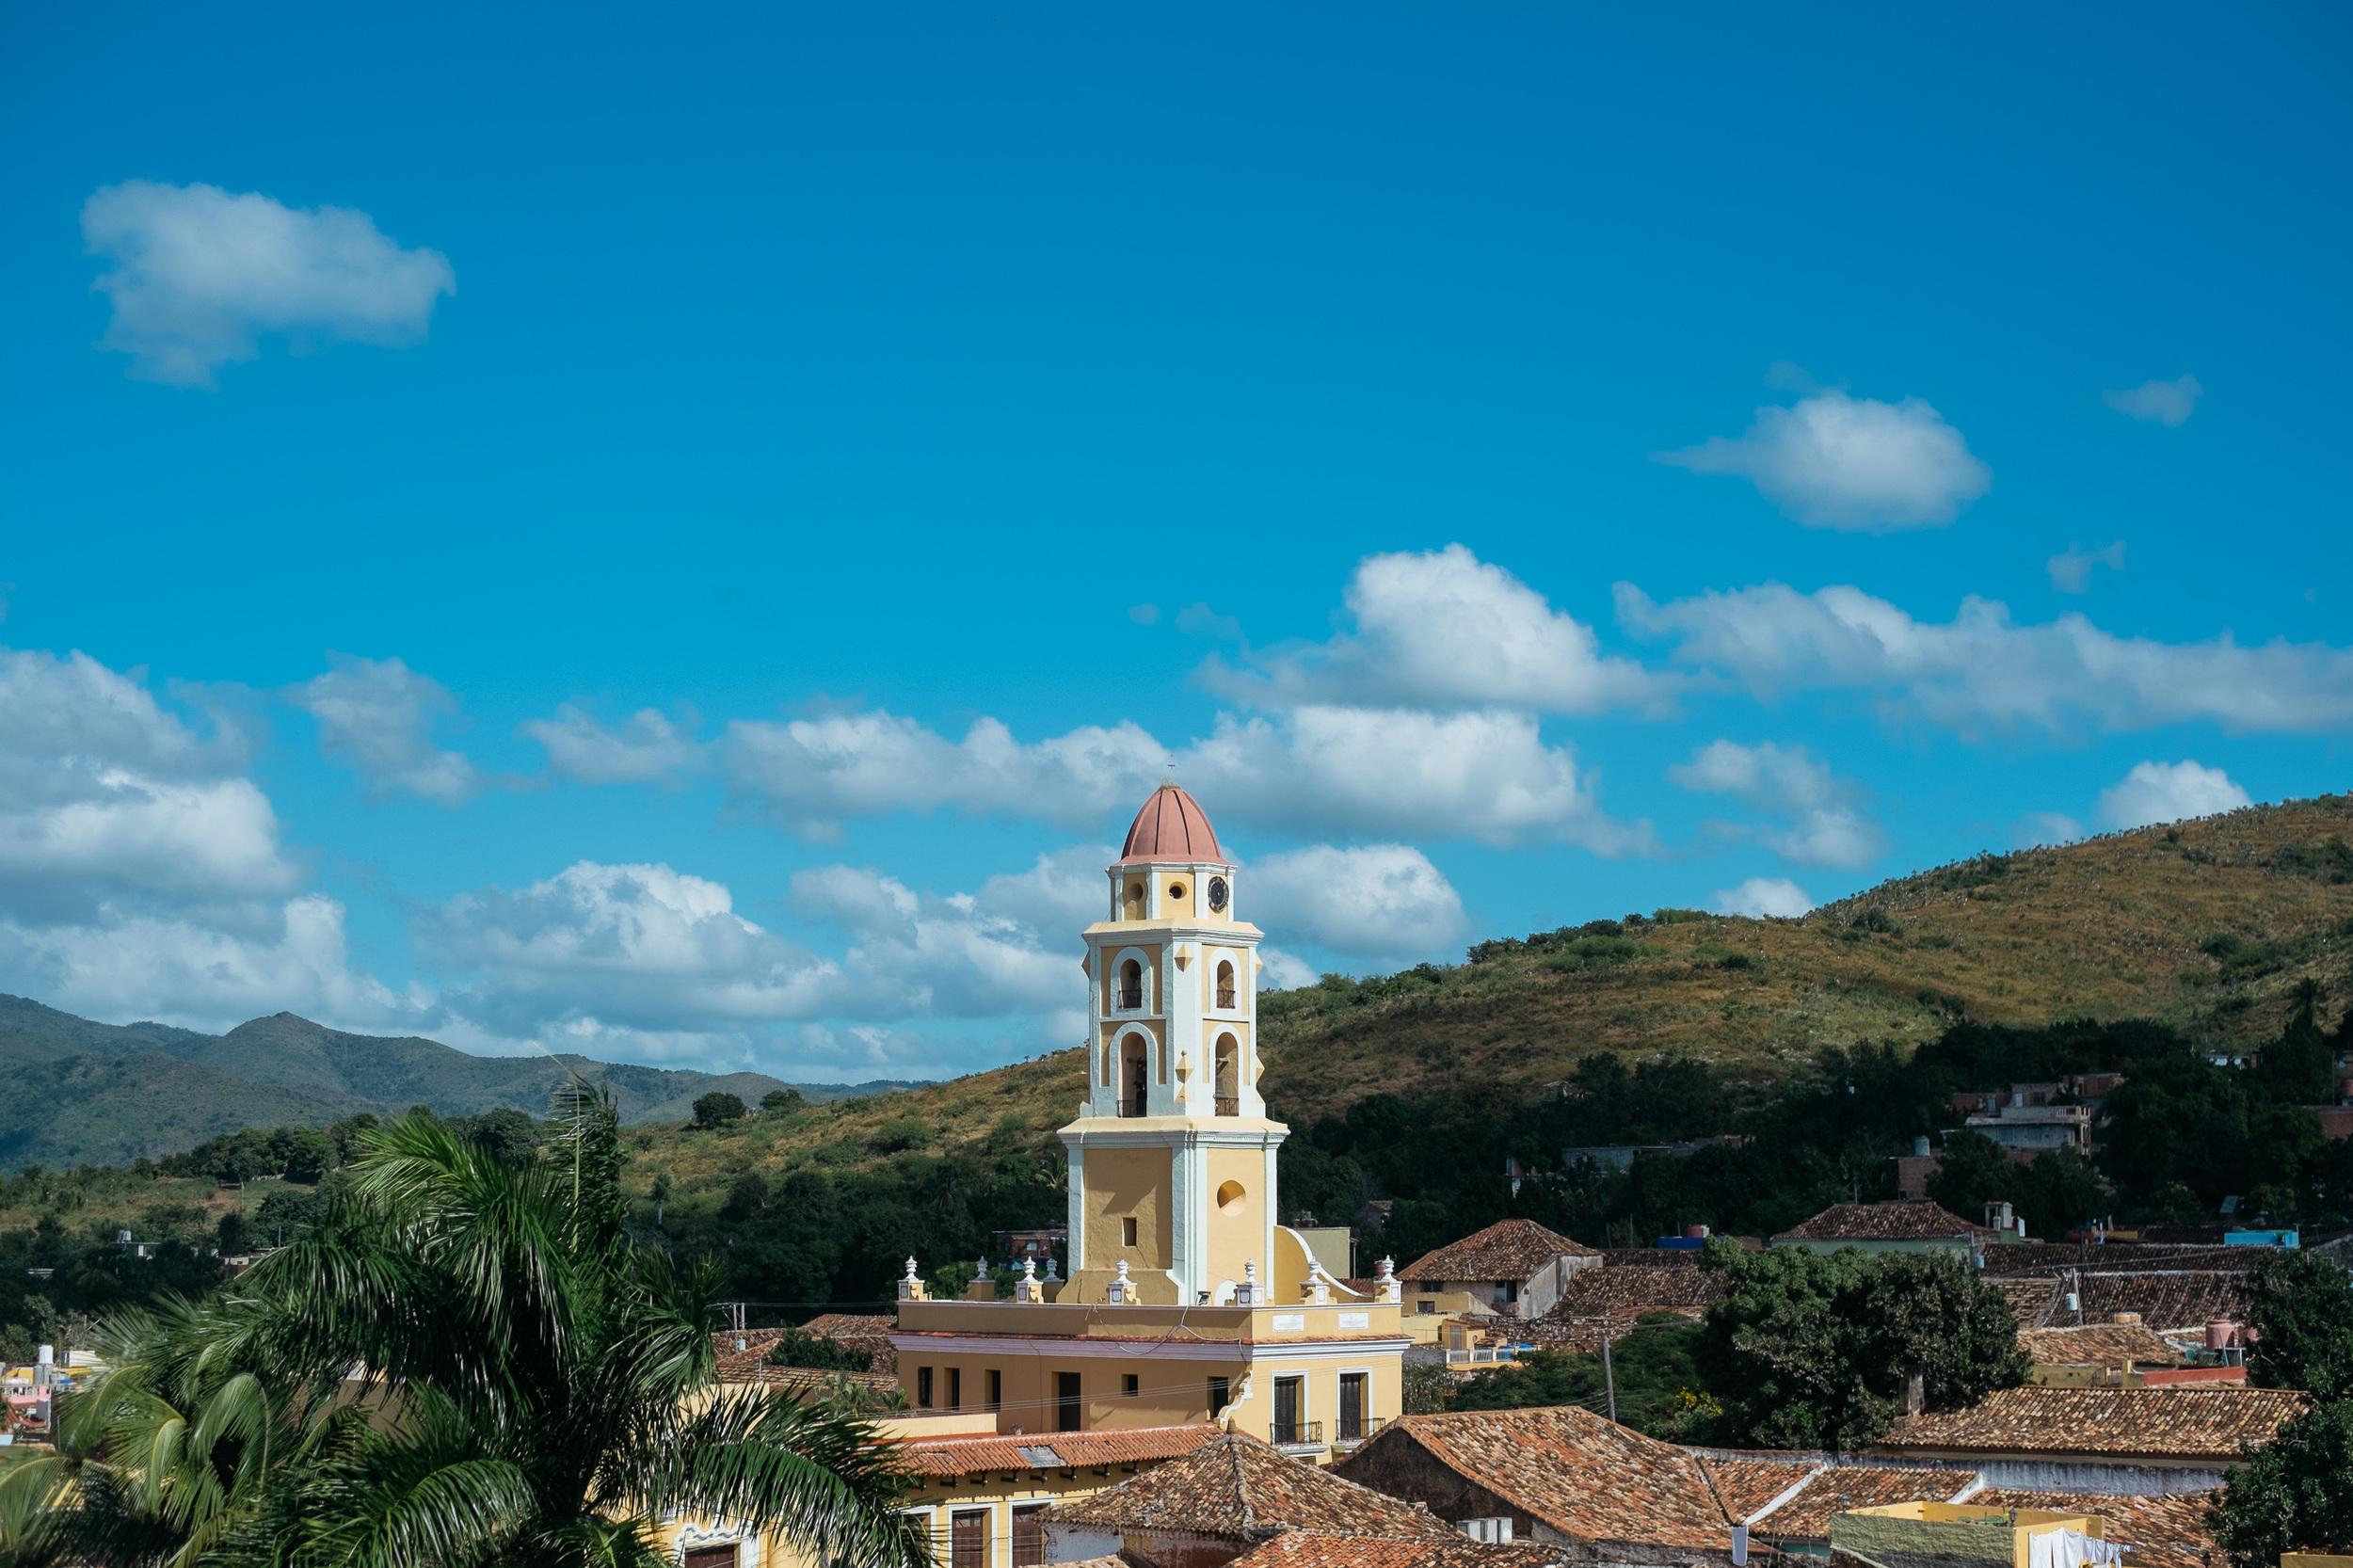 DeClaro-Photography-Cuba-0461.jpg